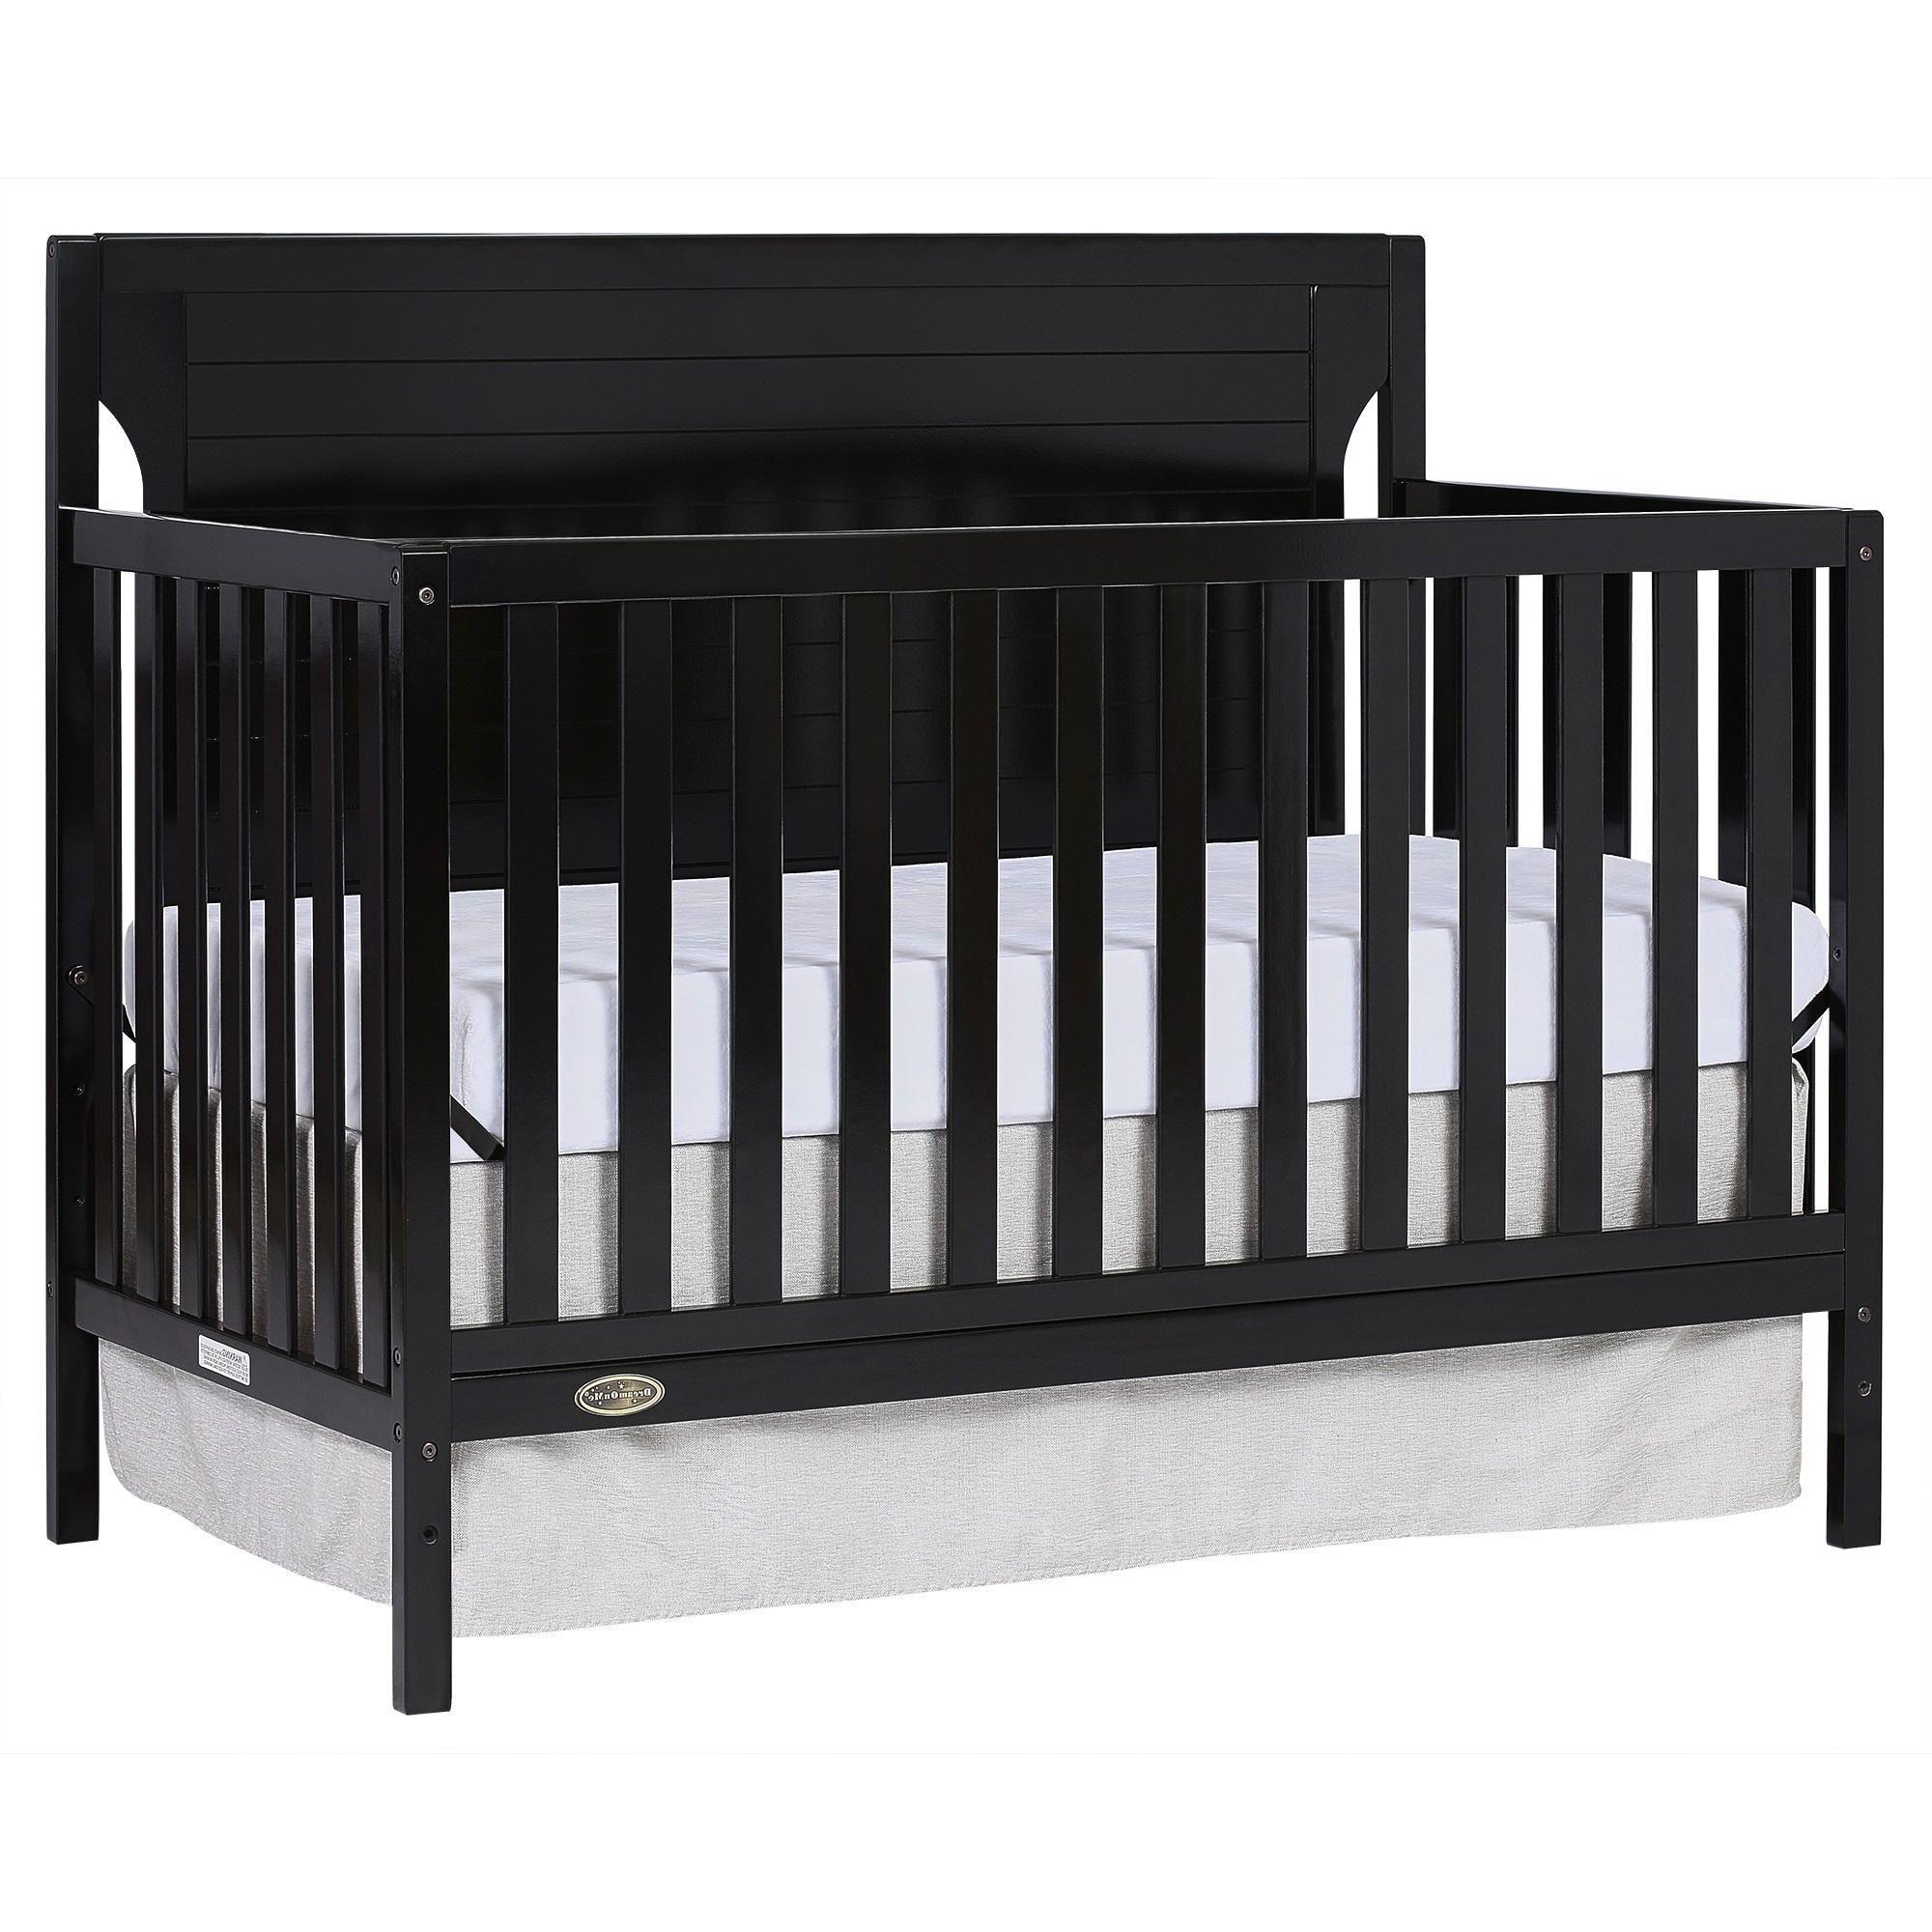 wayfair baby cribs kids convertible pdp dream reviews crib s in graco rory ca